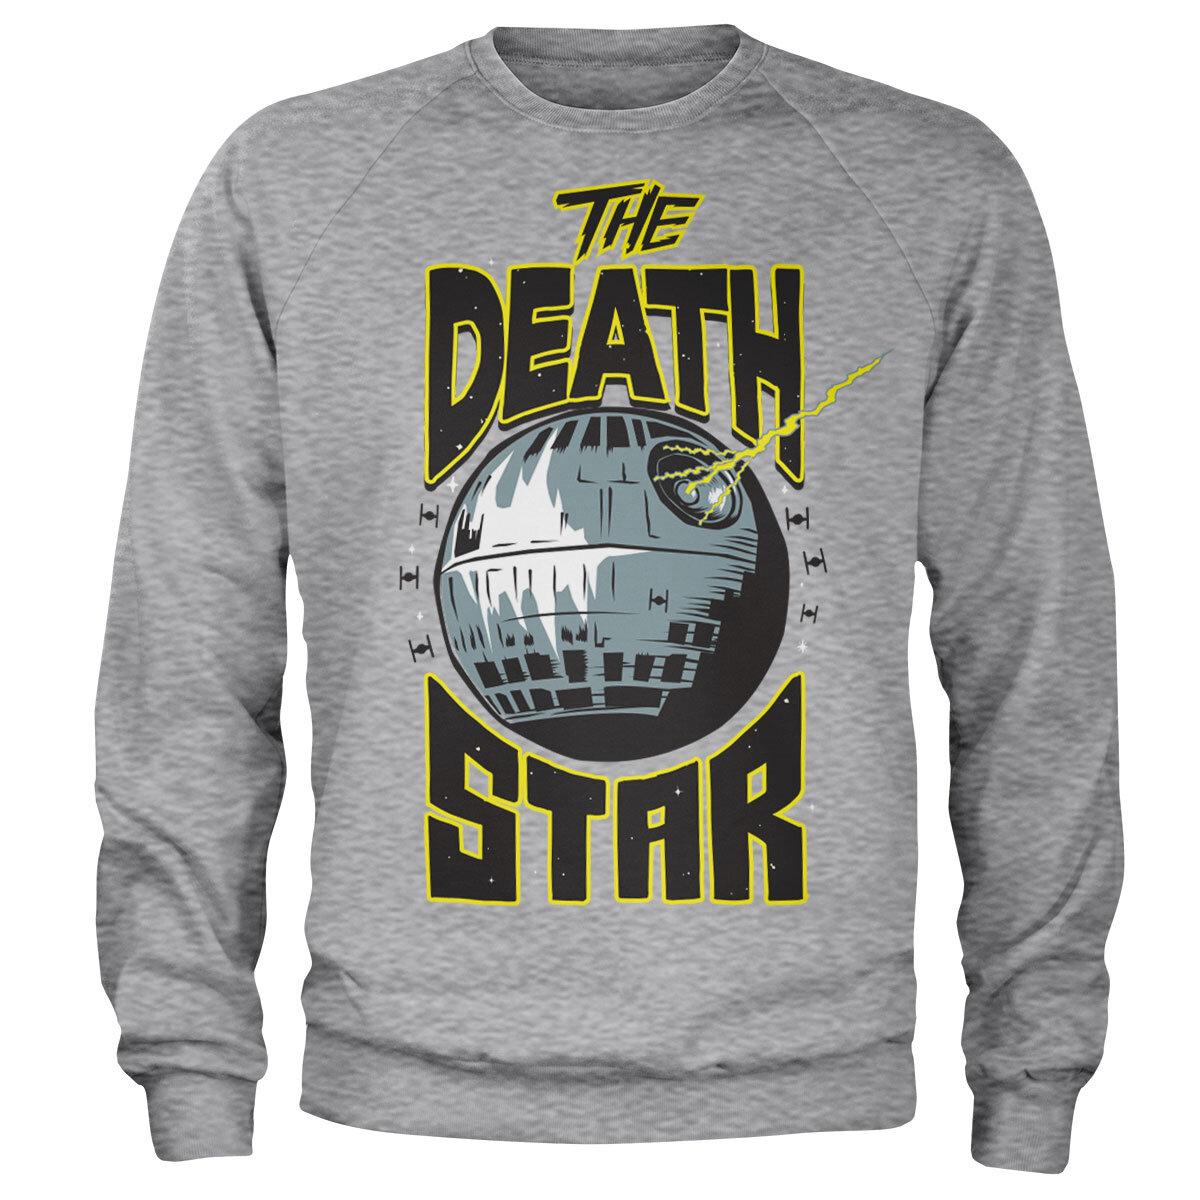 The Death Star Sweatshirt